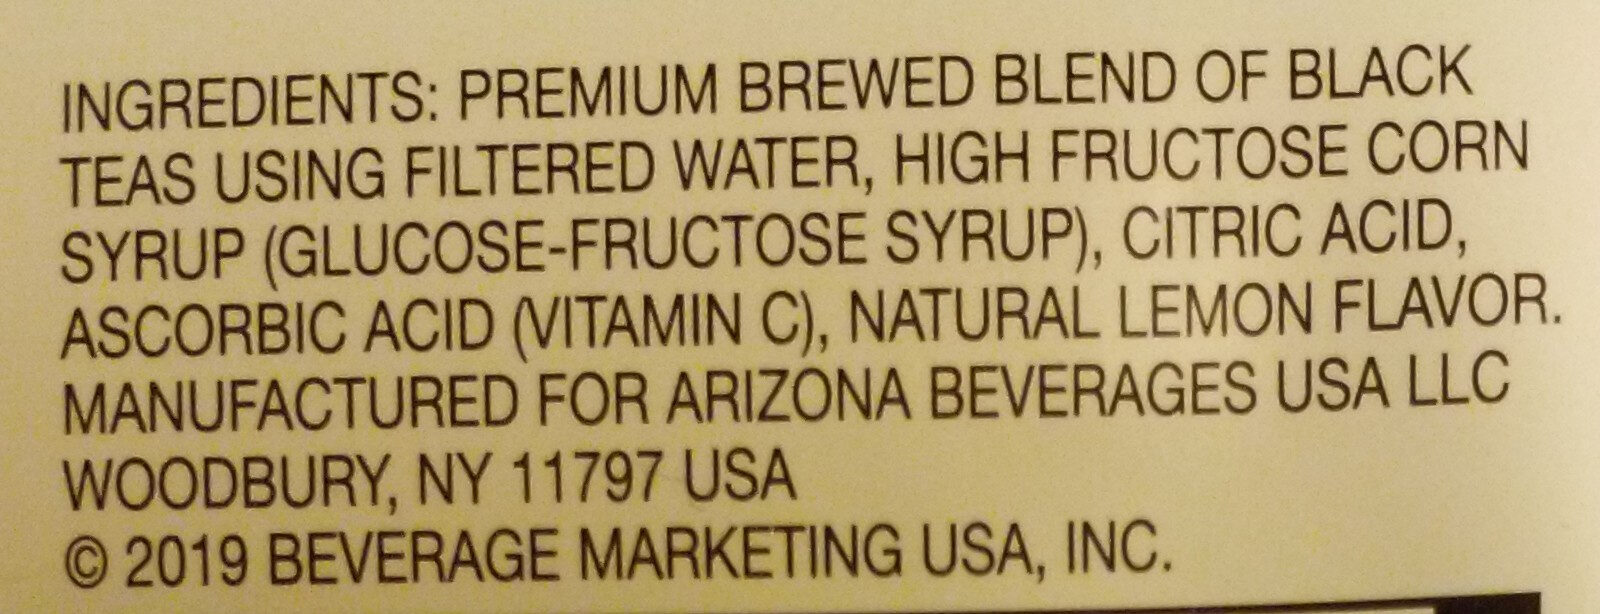 Iced Tea, Lemon - Ingredients